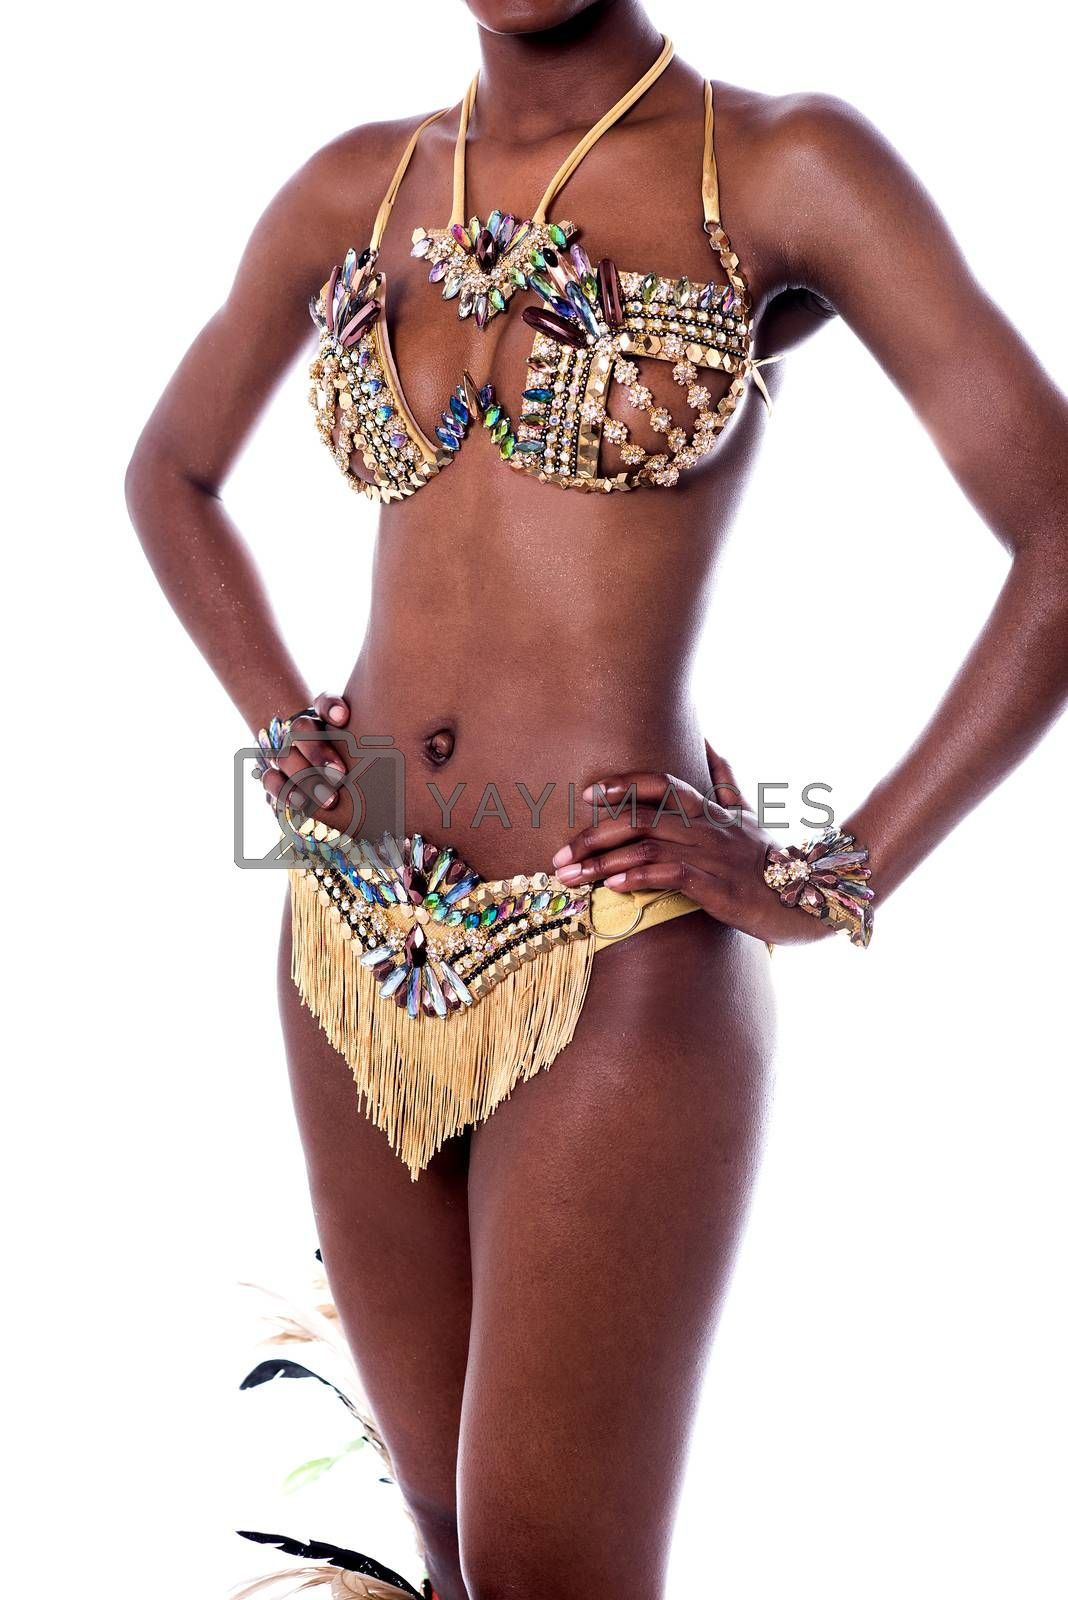 Cropped image of a woman samba dancer